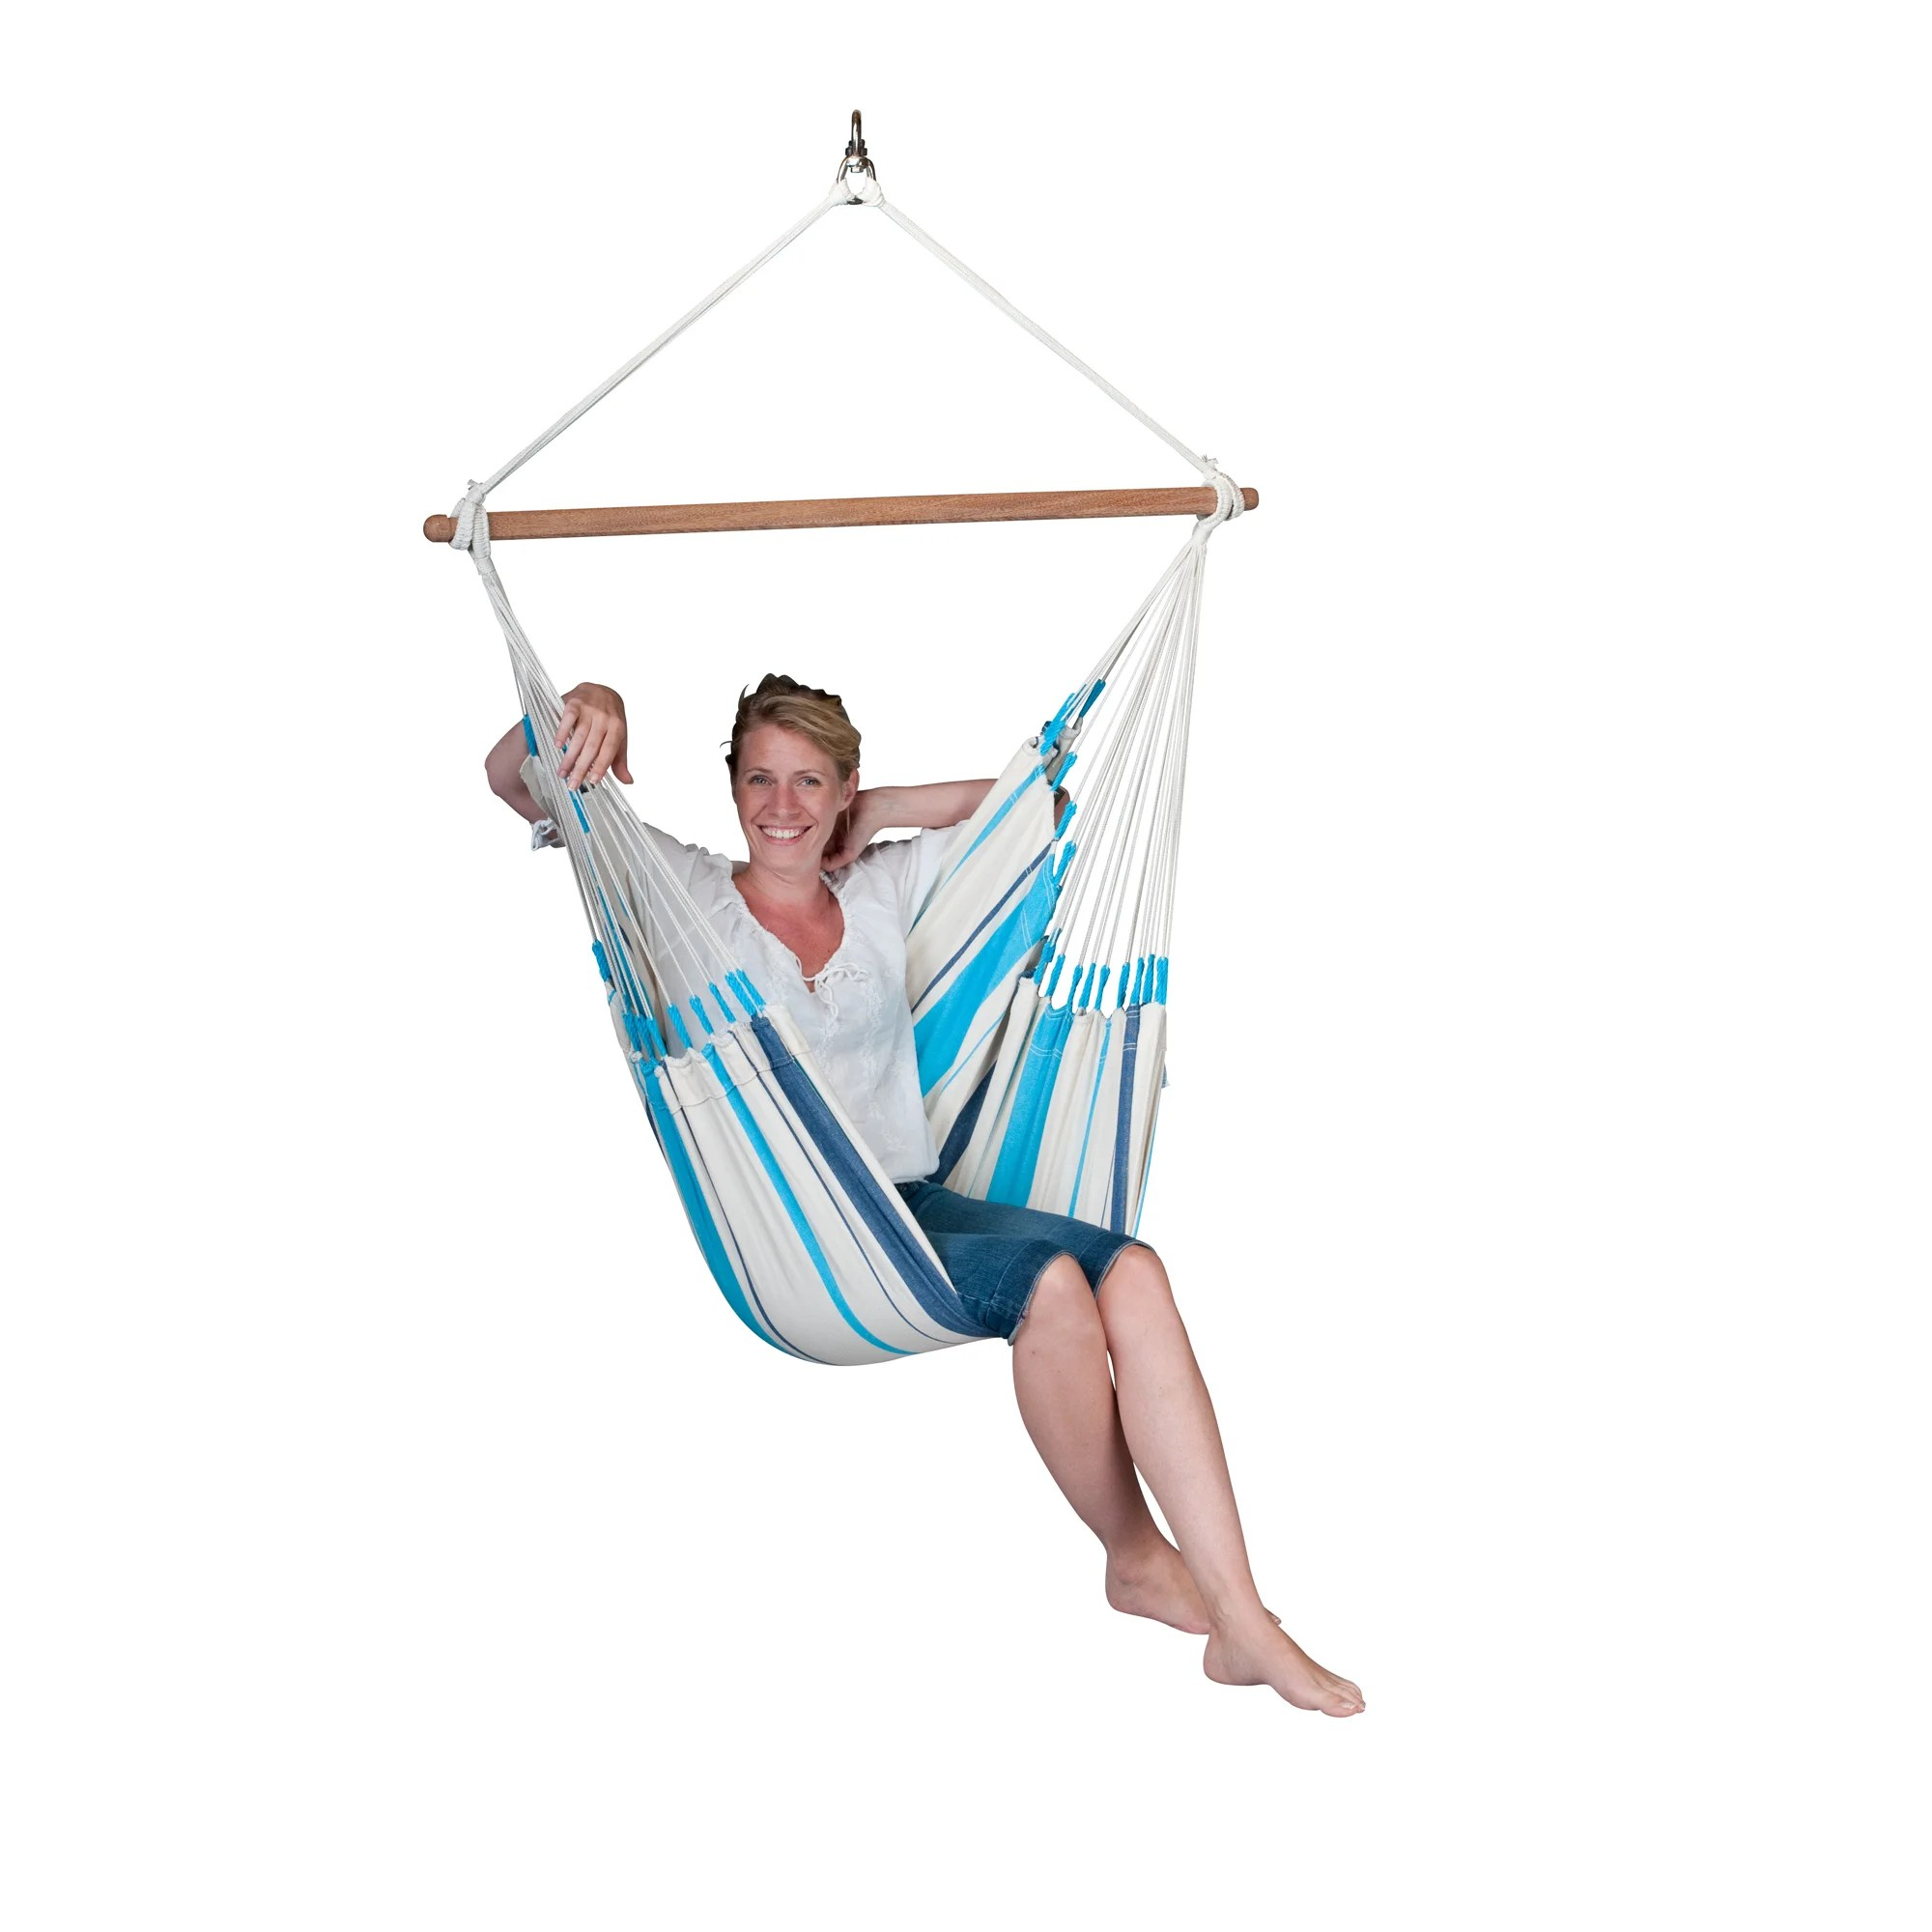 la siesta hammock chair childrens wooden table and chairs caribeÑa reviews wayfair